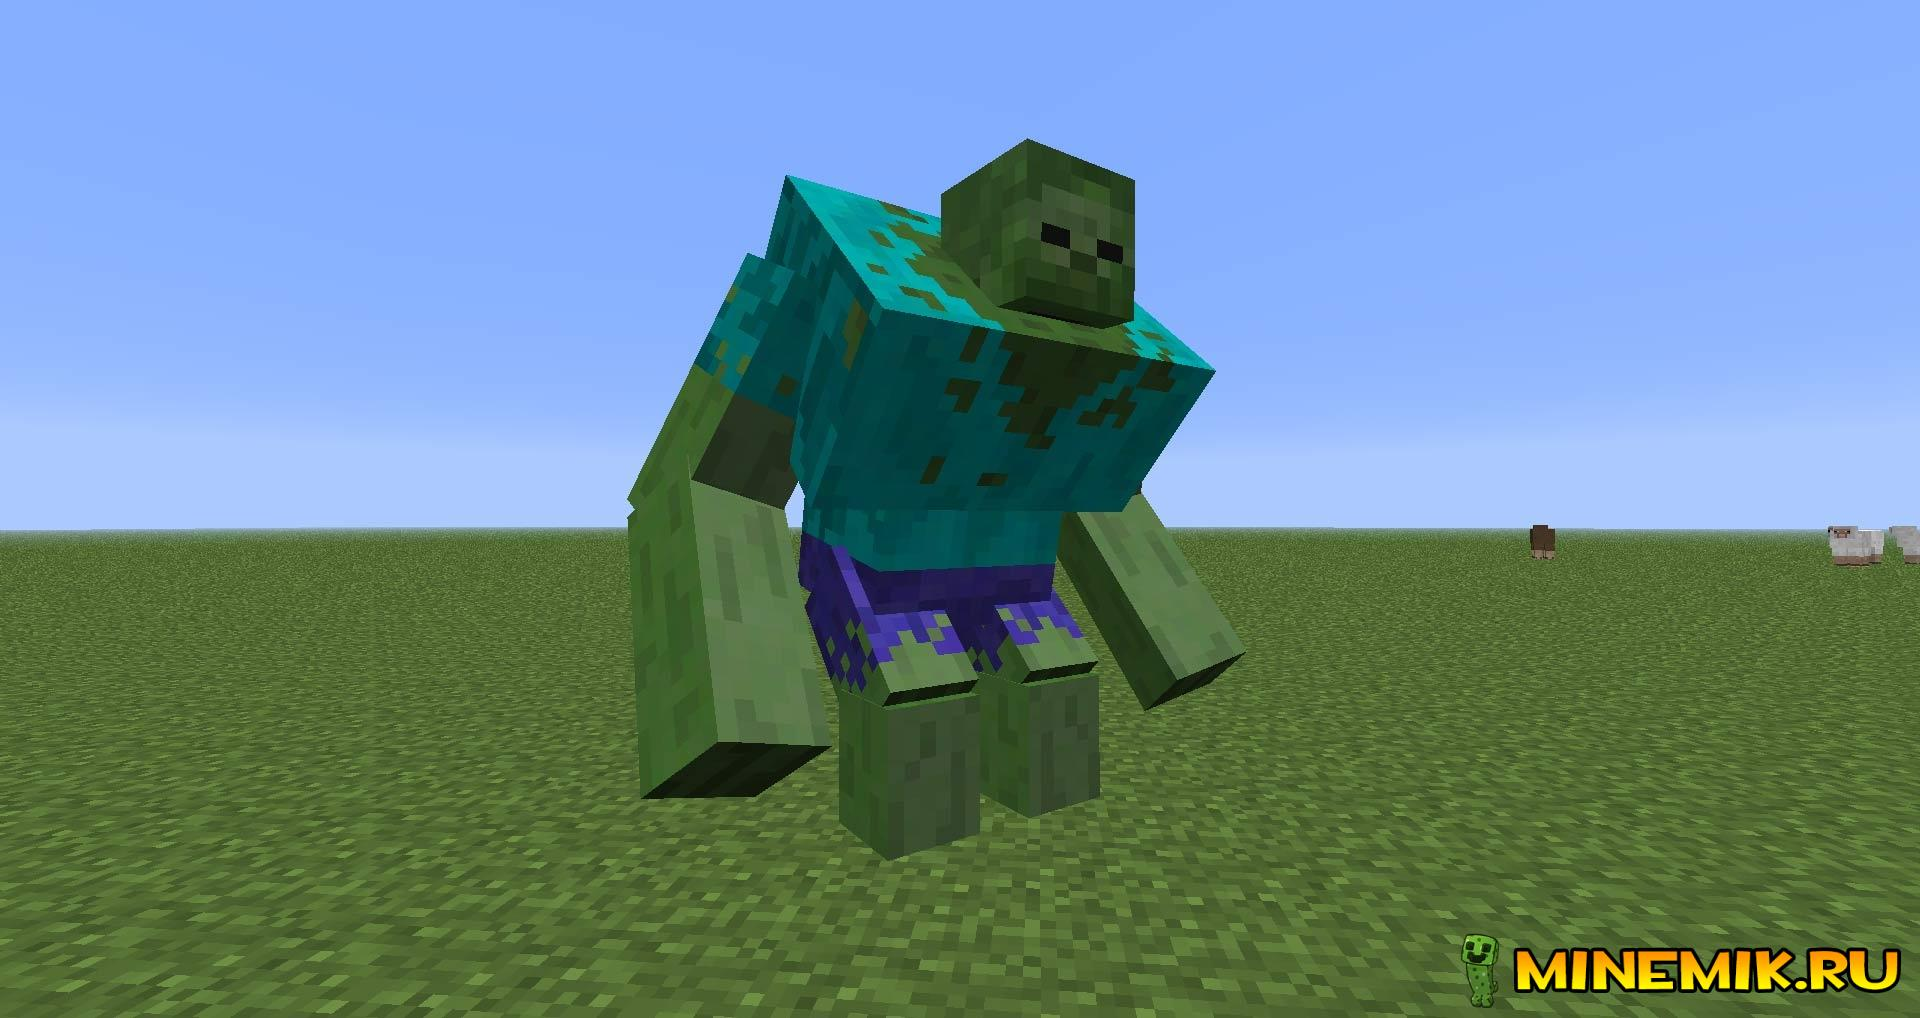 Мод Mutant Creatures Mod для minecraft PC